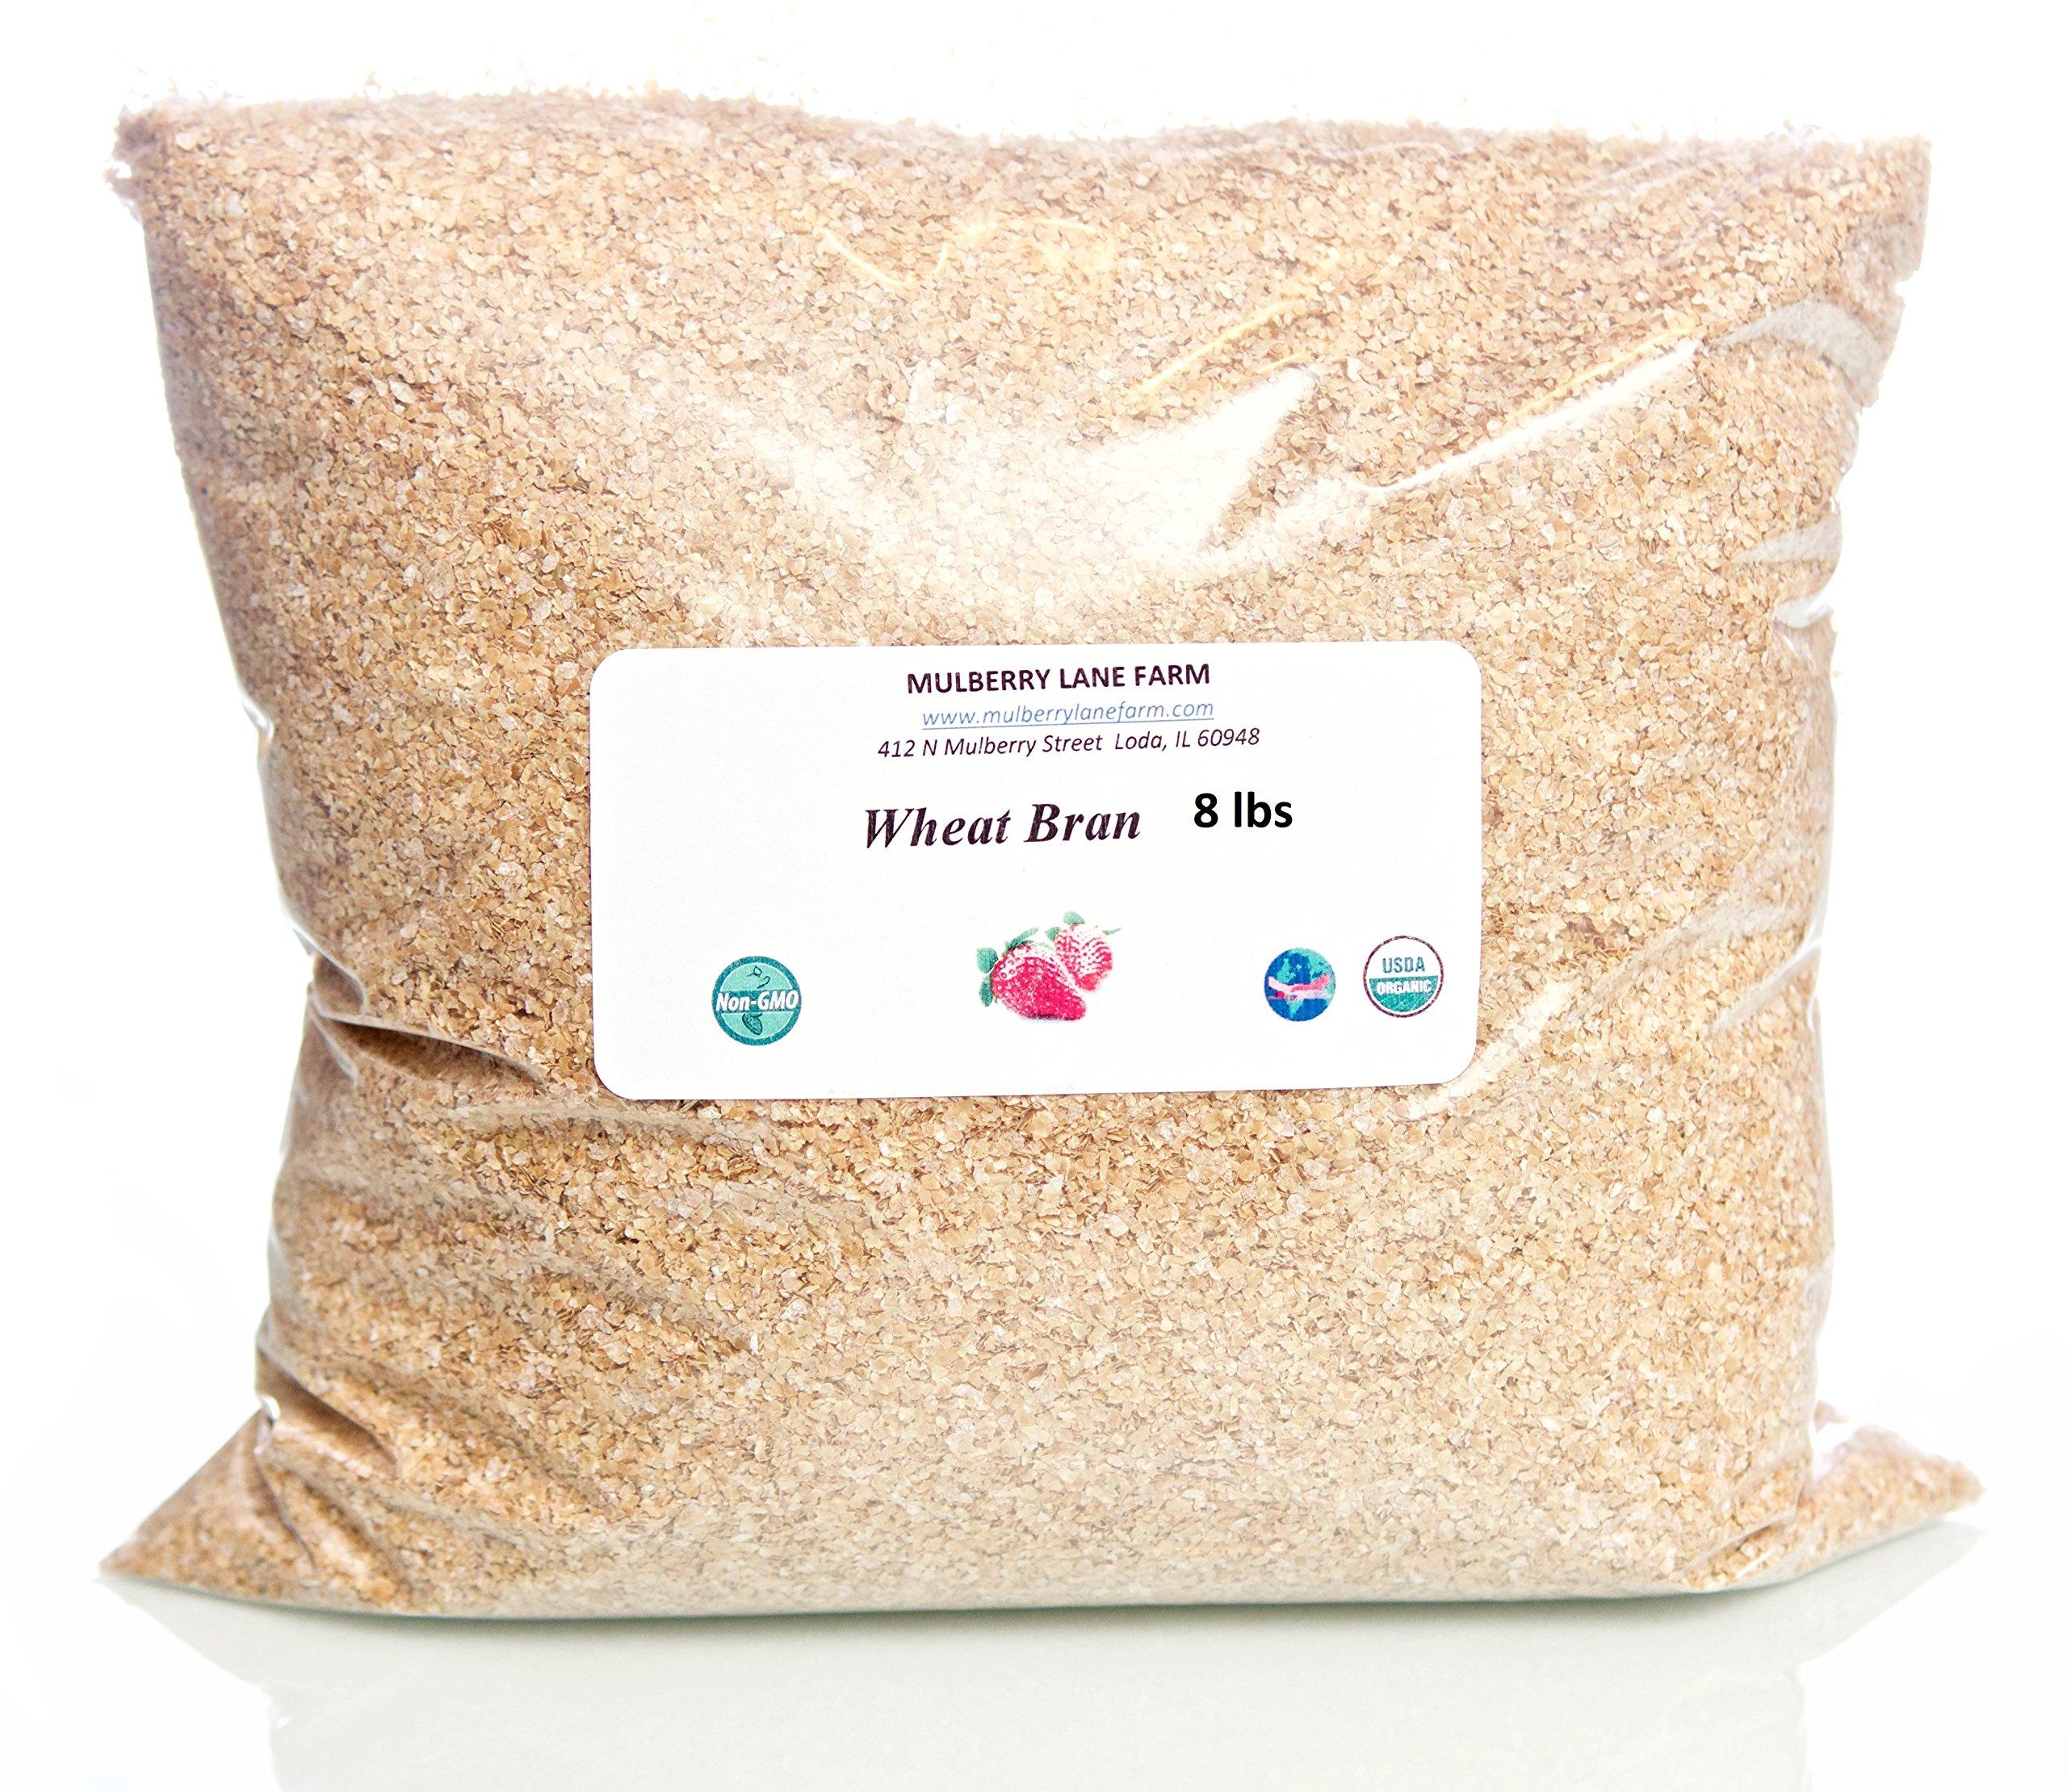 Wheat Bran 8 lbs (8 pounds), USDA Certified Organic, Non-GMO, BULK.